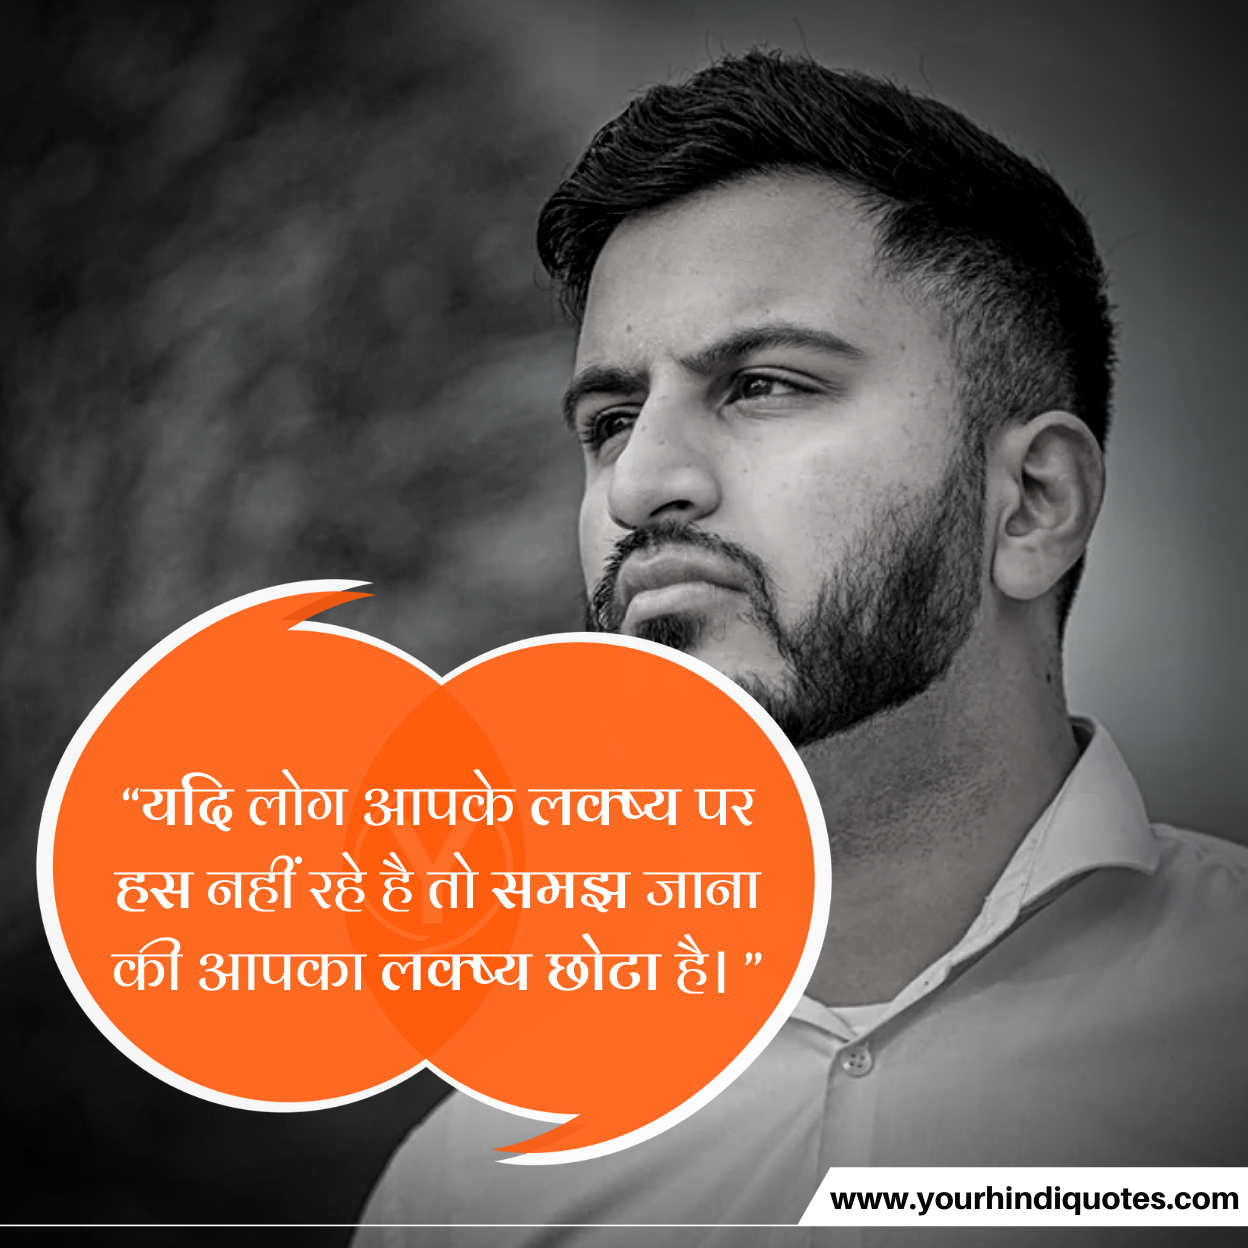 Motivational Thoughts Hindi Images